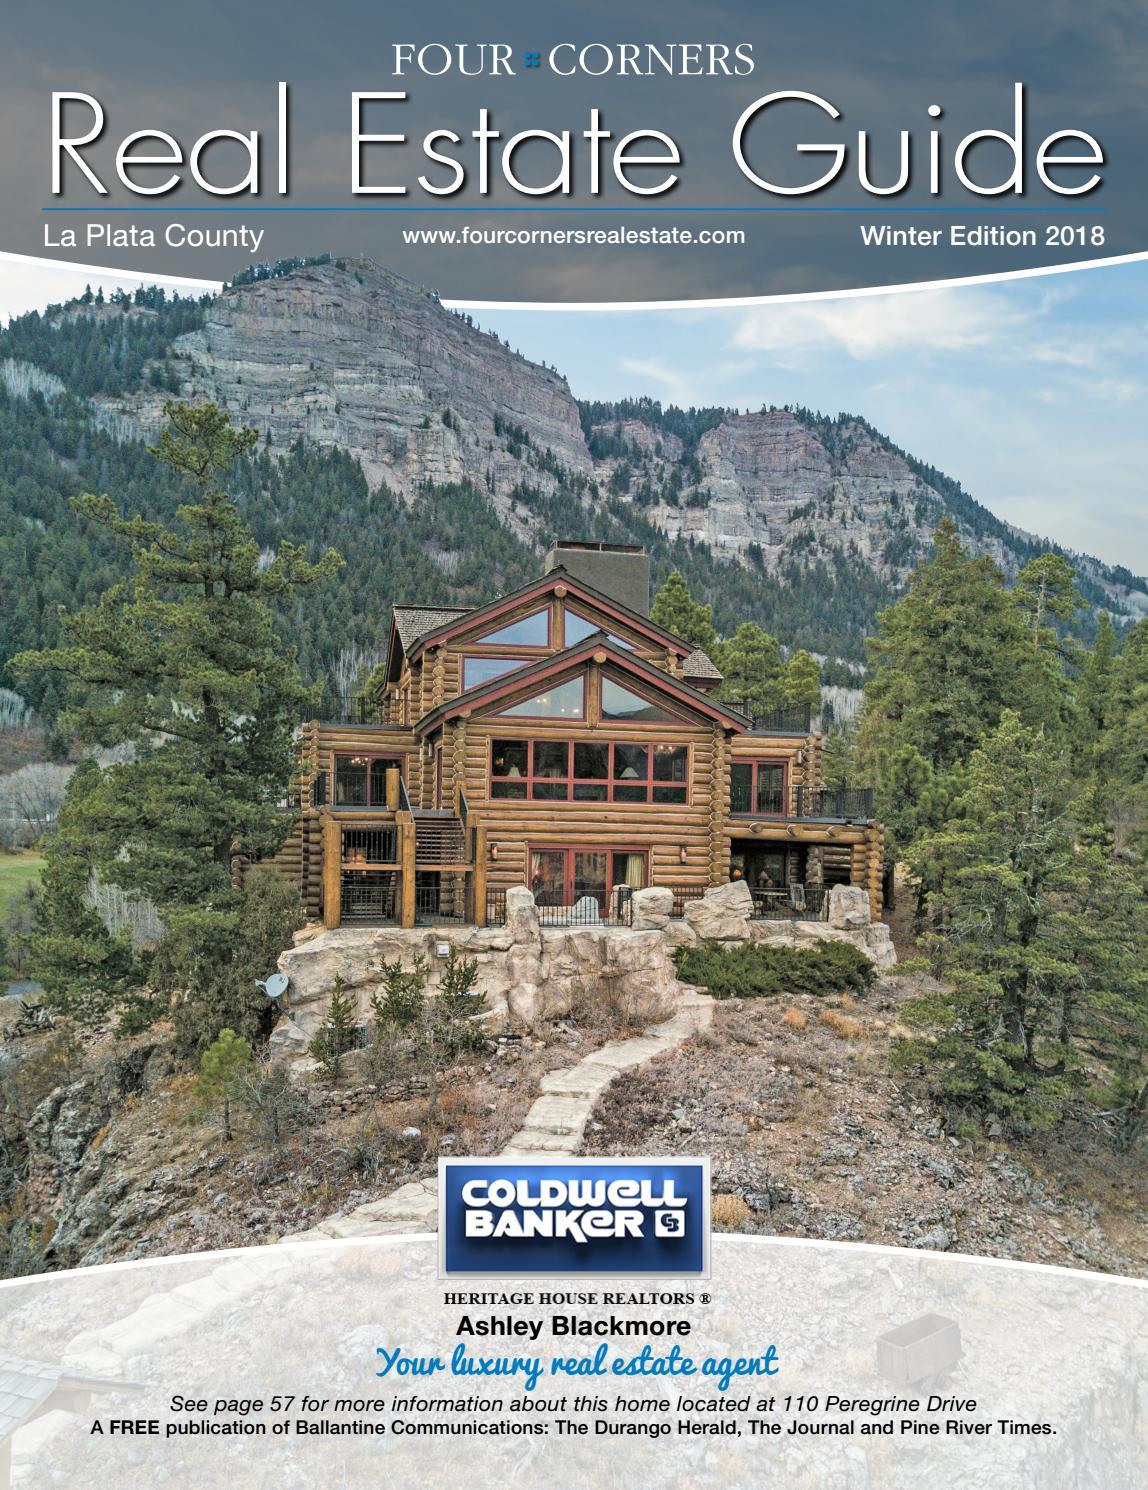 Four Corners Real Estate Guide Winter 2018 By Ballantine Guten Inc Dyer Green White Shirt Communications Issuu